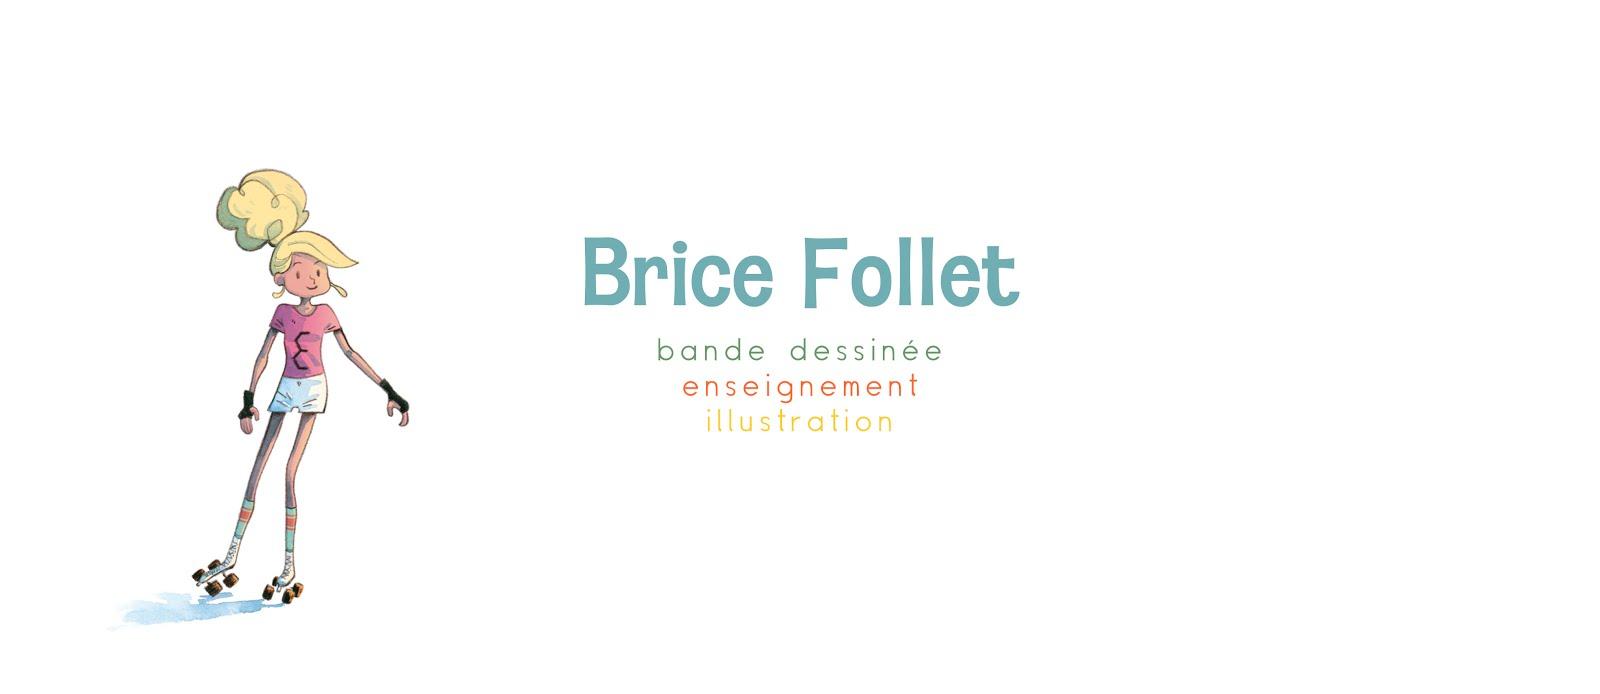 Brice Follet